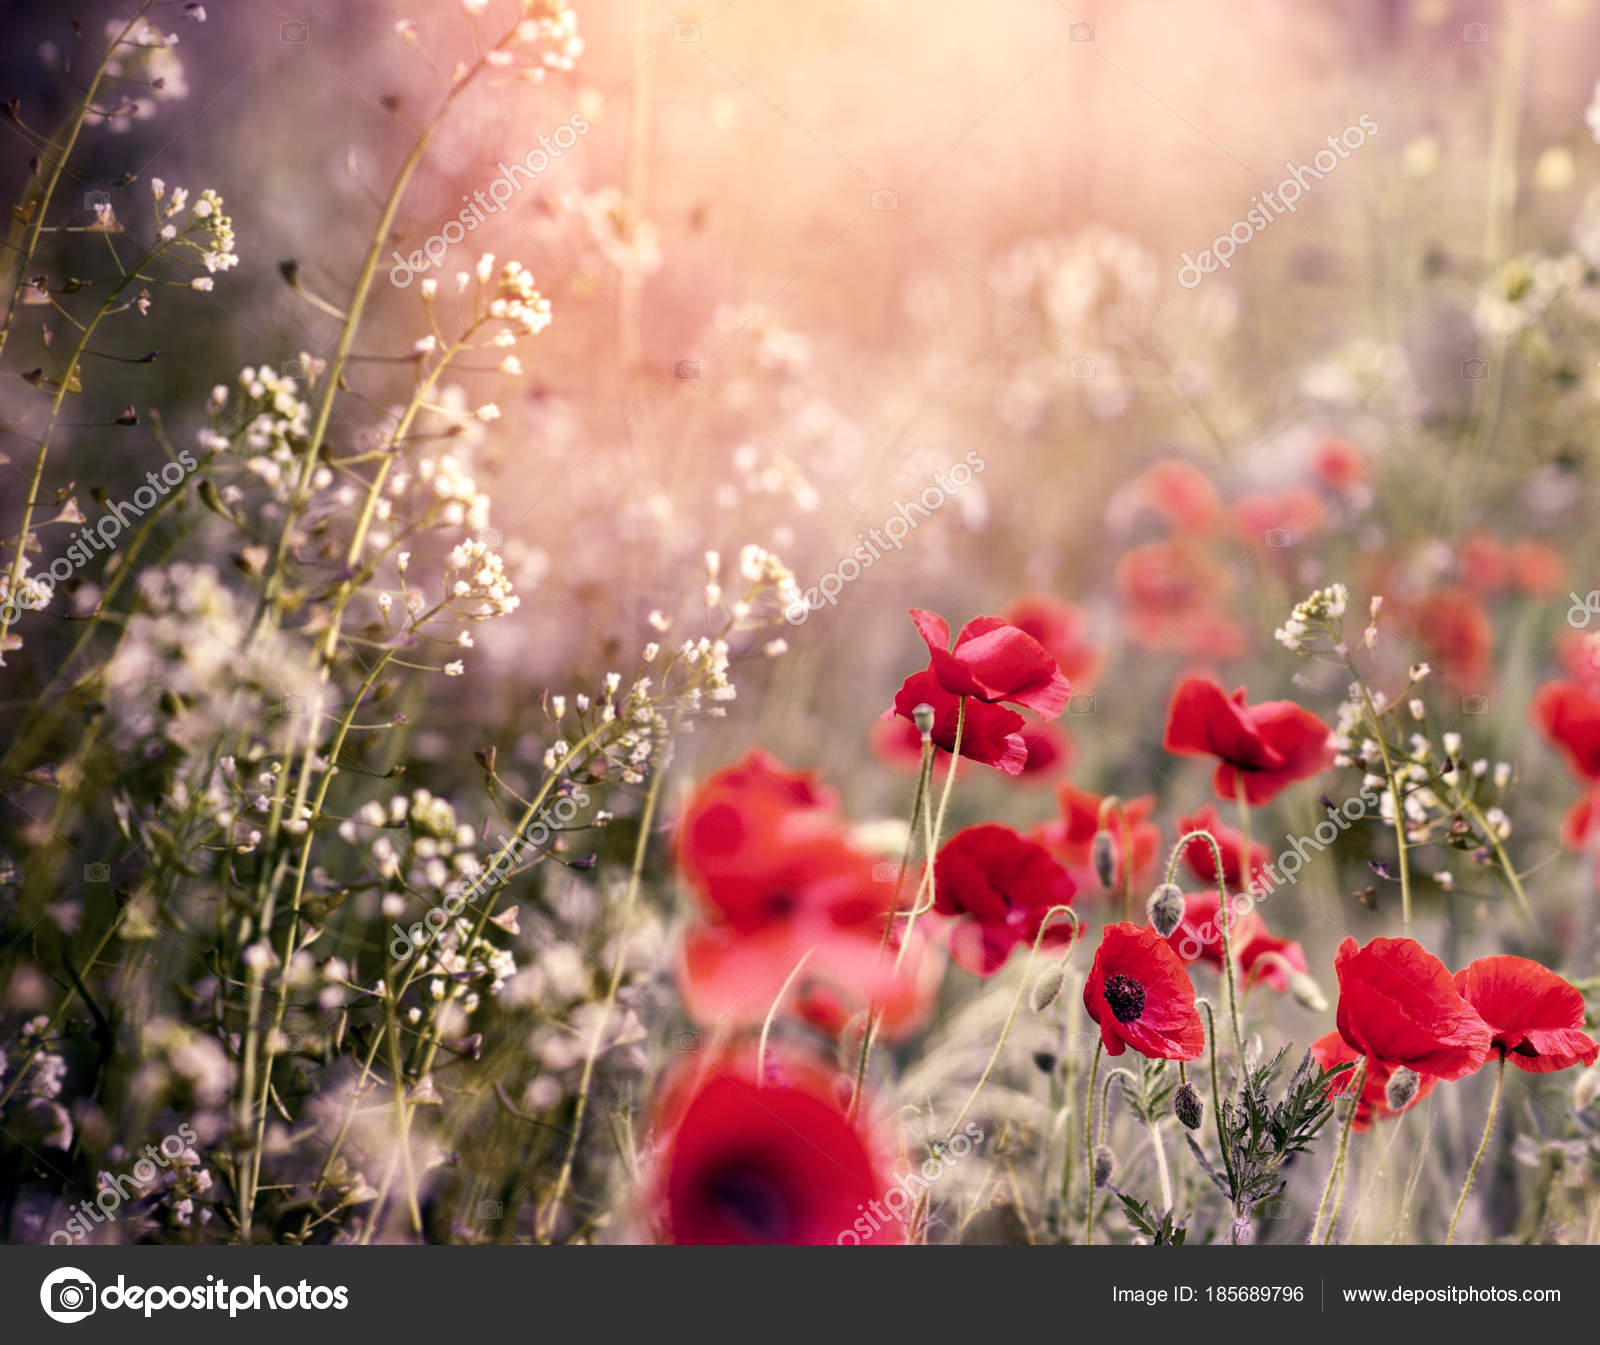 Red Poppy Flower Meadow Little White Flowers Beautiful Nature